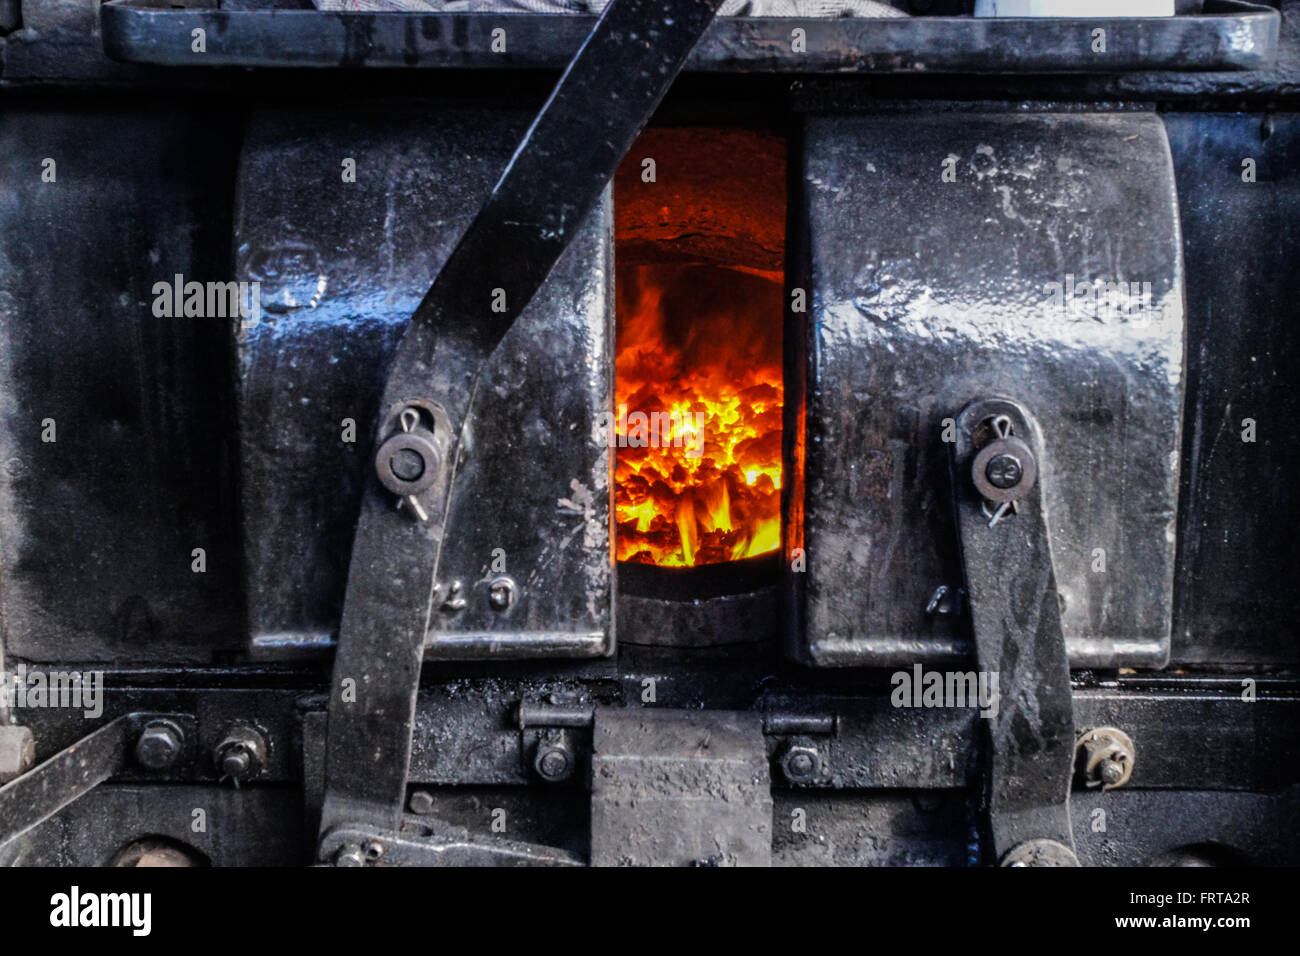 Firebox of 6100 Royal Scot - Stock Image